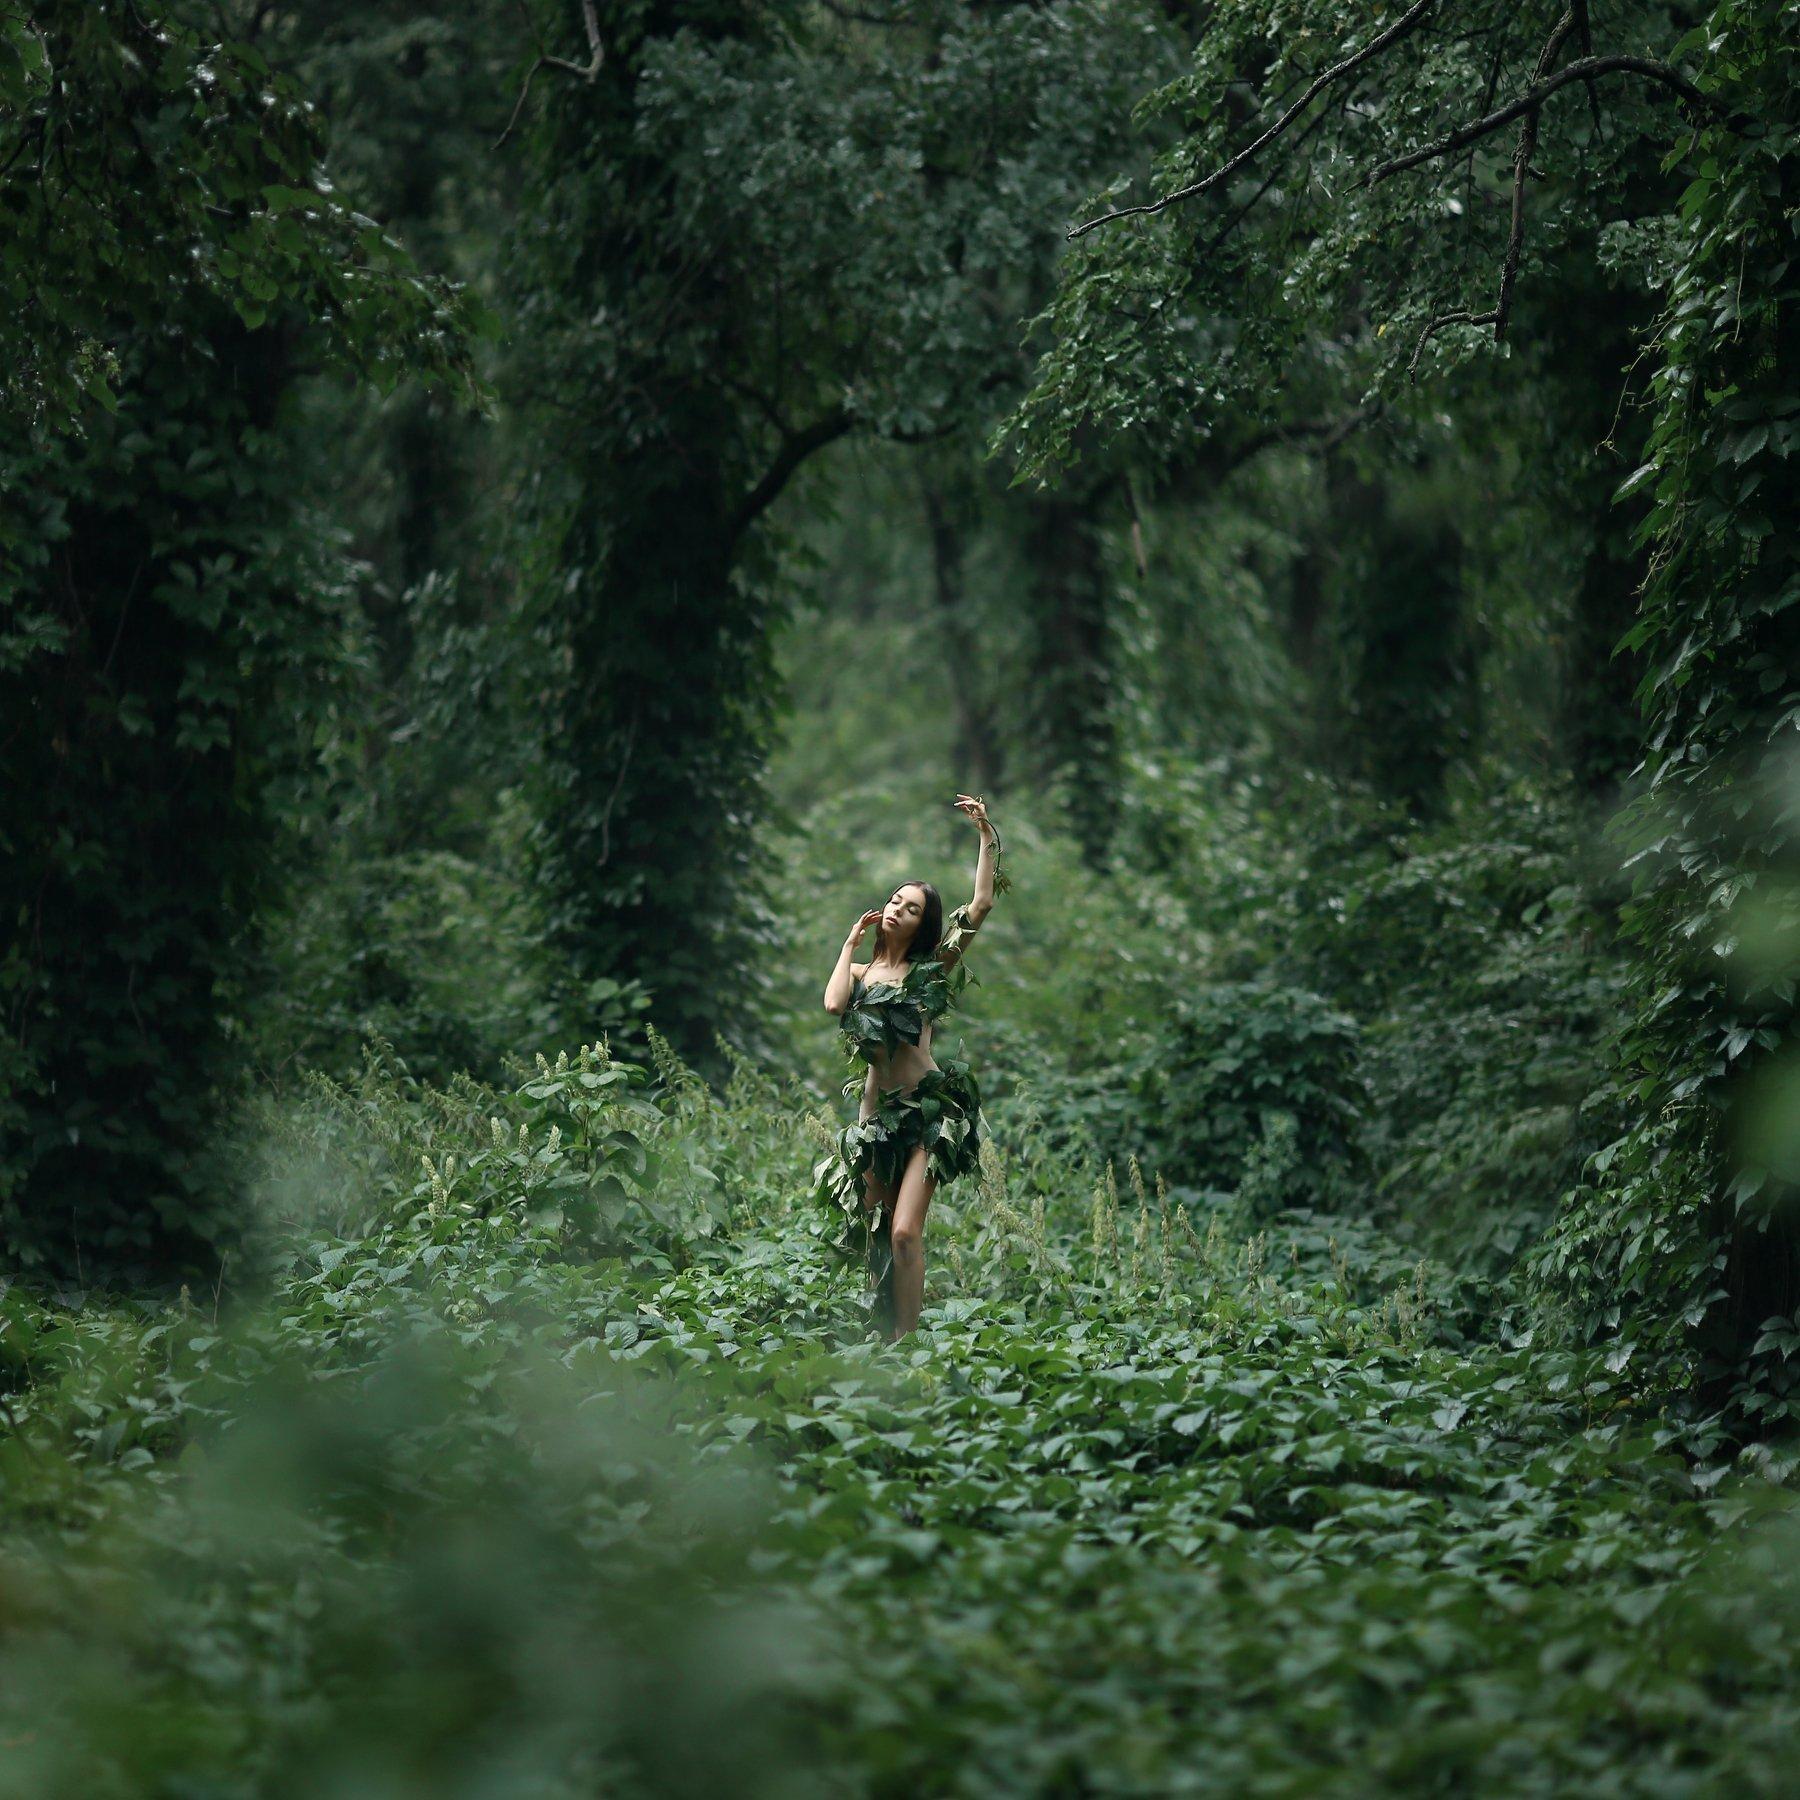 лес, заросли, нимфа, лесная нимфа, джунгли, Ирина Голубятникова